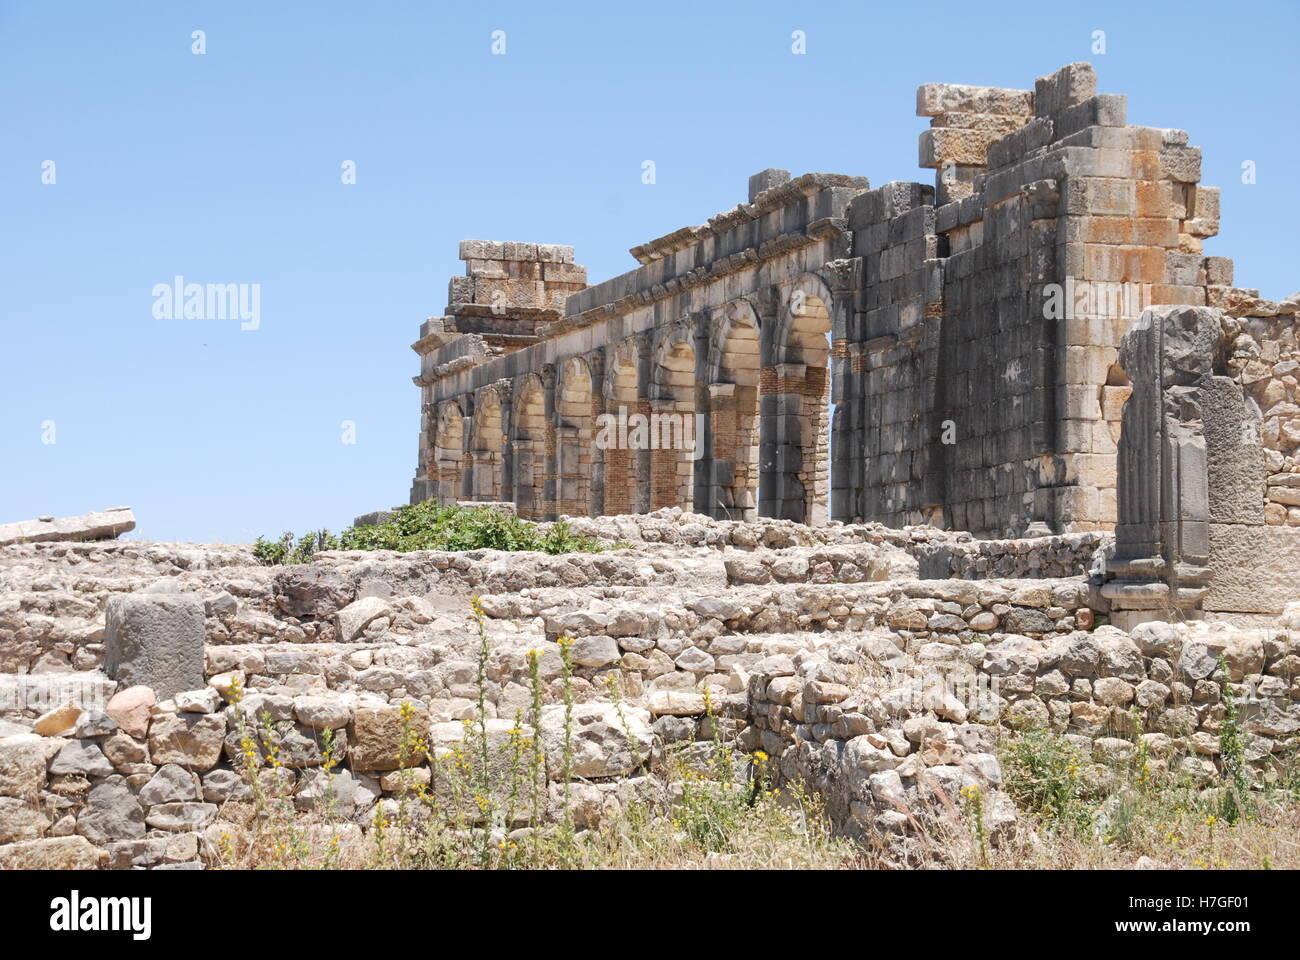 Volubilis Ruins in Morocco - Stock Image